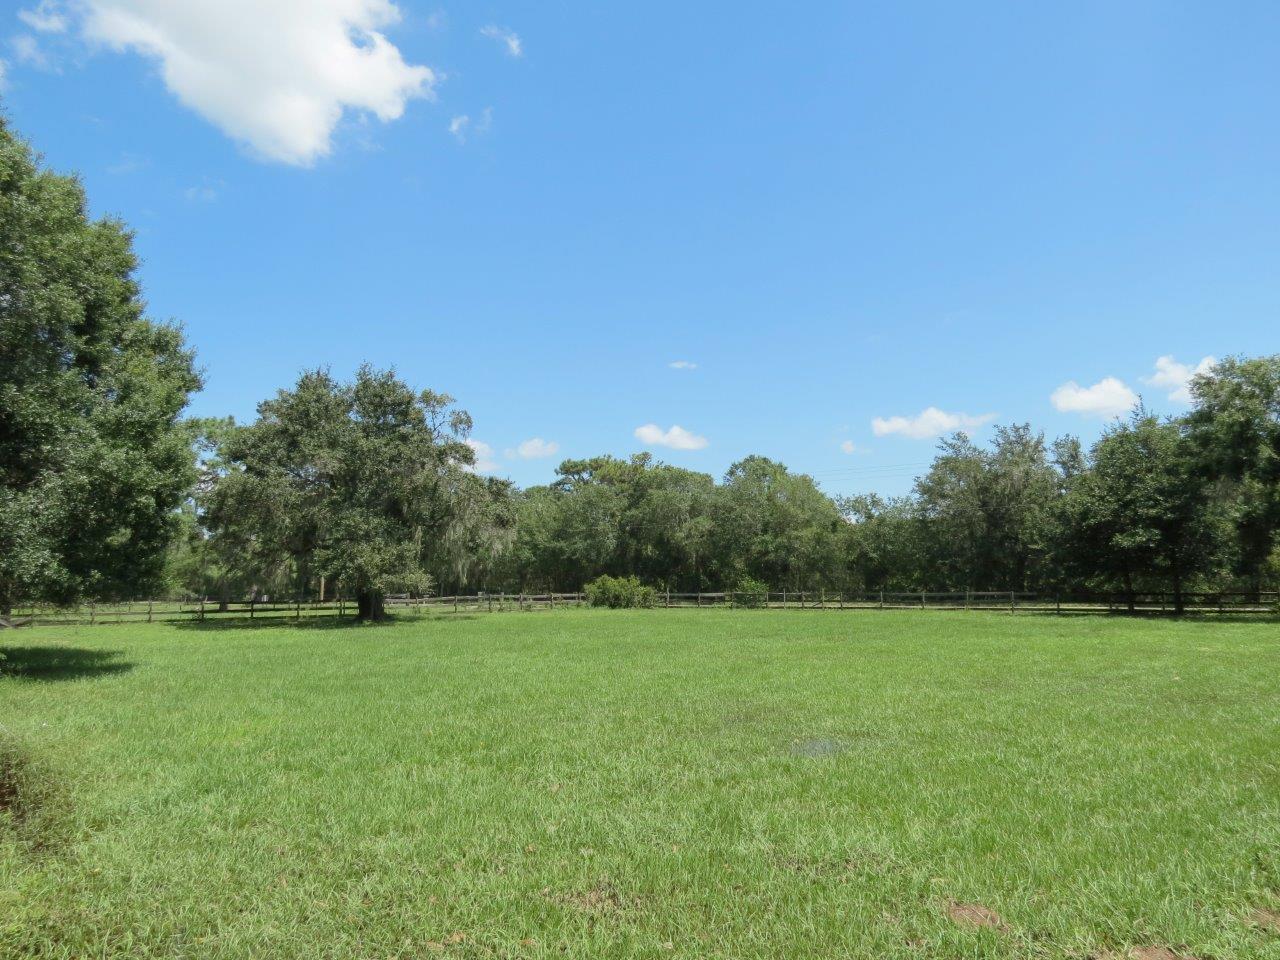 Lithia Ranchette 7.5 +/- Acre Homesite in Lithia, FL